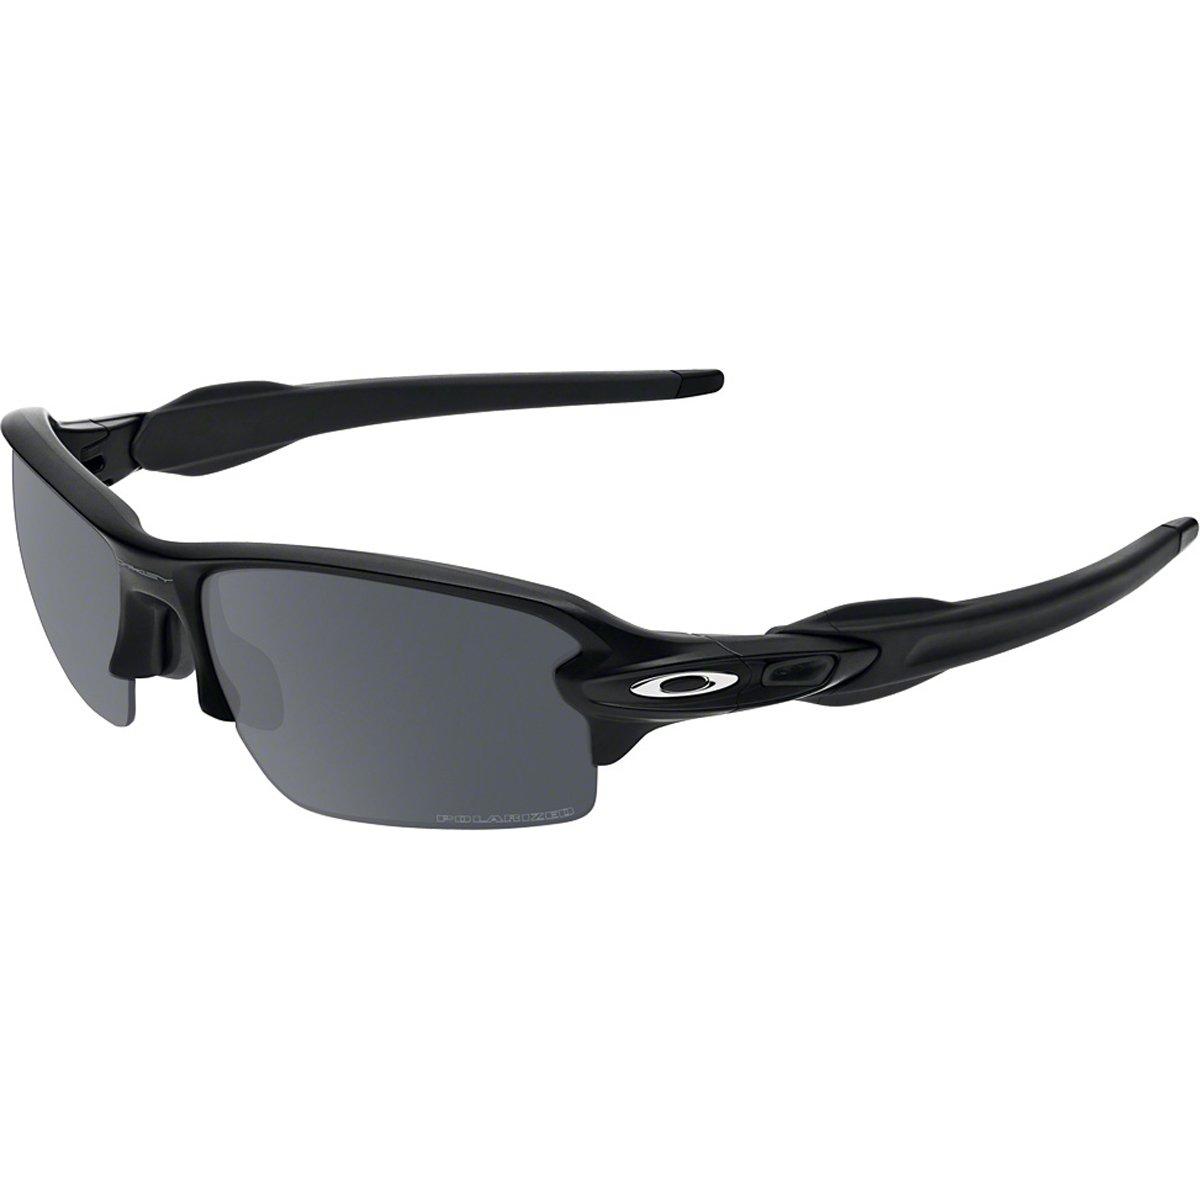 Oakley Men's OO9295 Flak 2.0 Rectangular Sunglasses, Polished Black/Black Iridium Polarized, 59 mm by Oakley